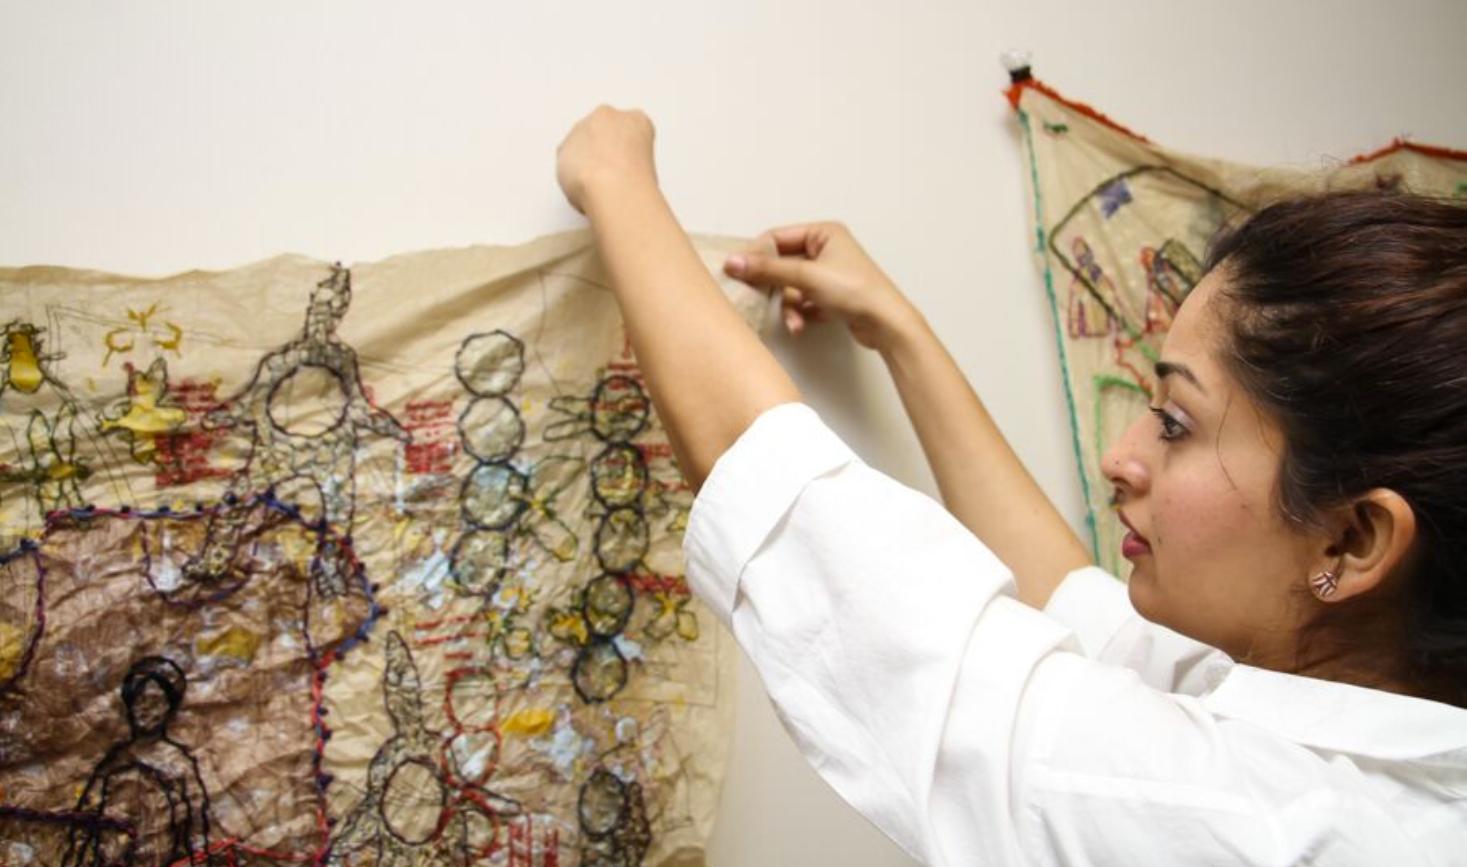 Mehwish Iqbal installing work.Image courtesy of the artist